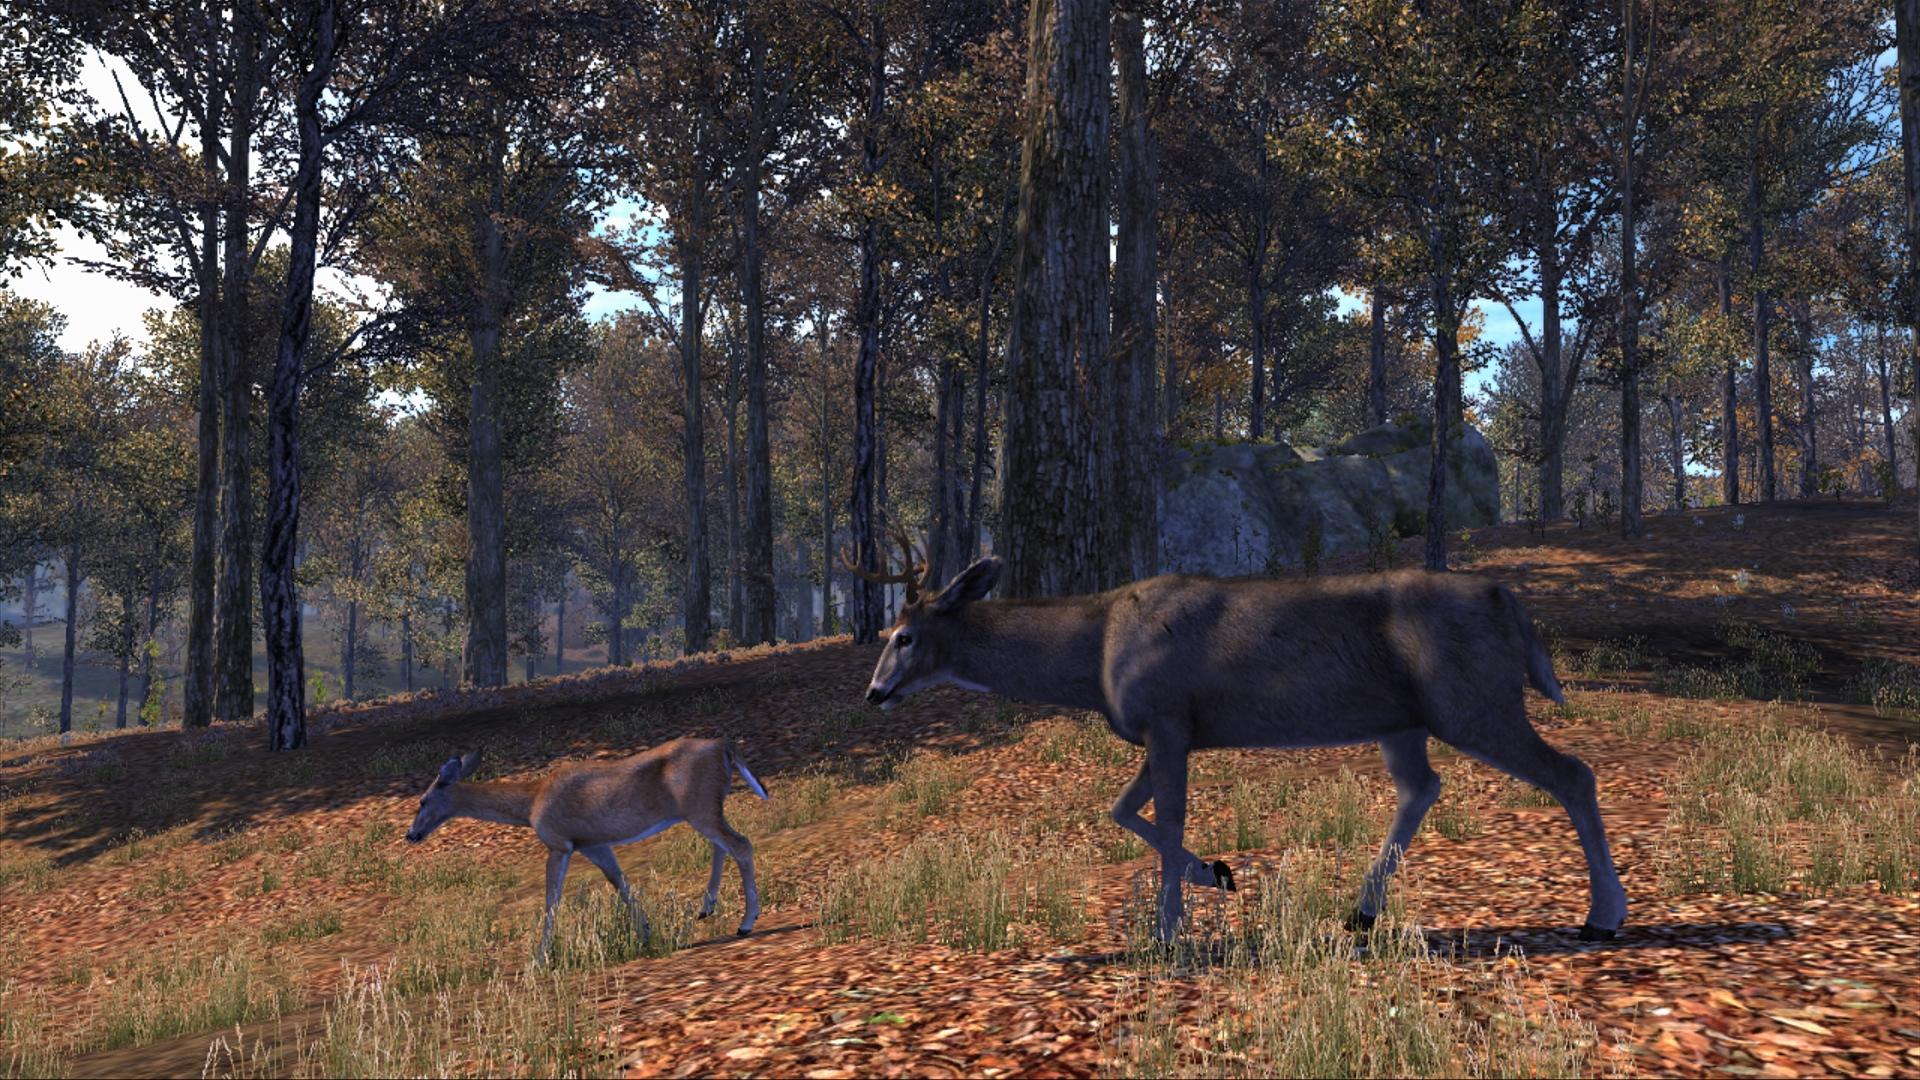 cabelas big game hunter pro hunts 2014 gameplay pc download